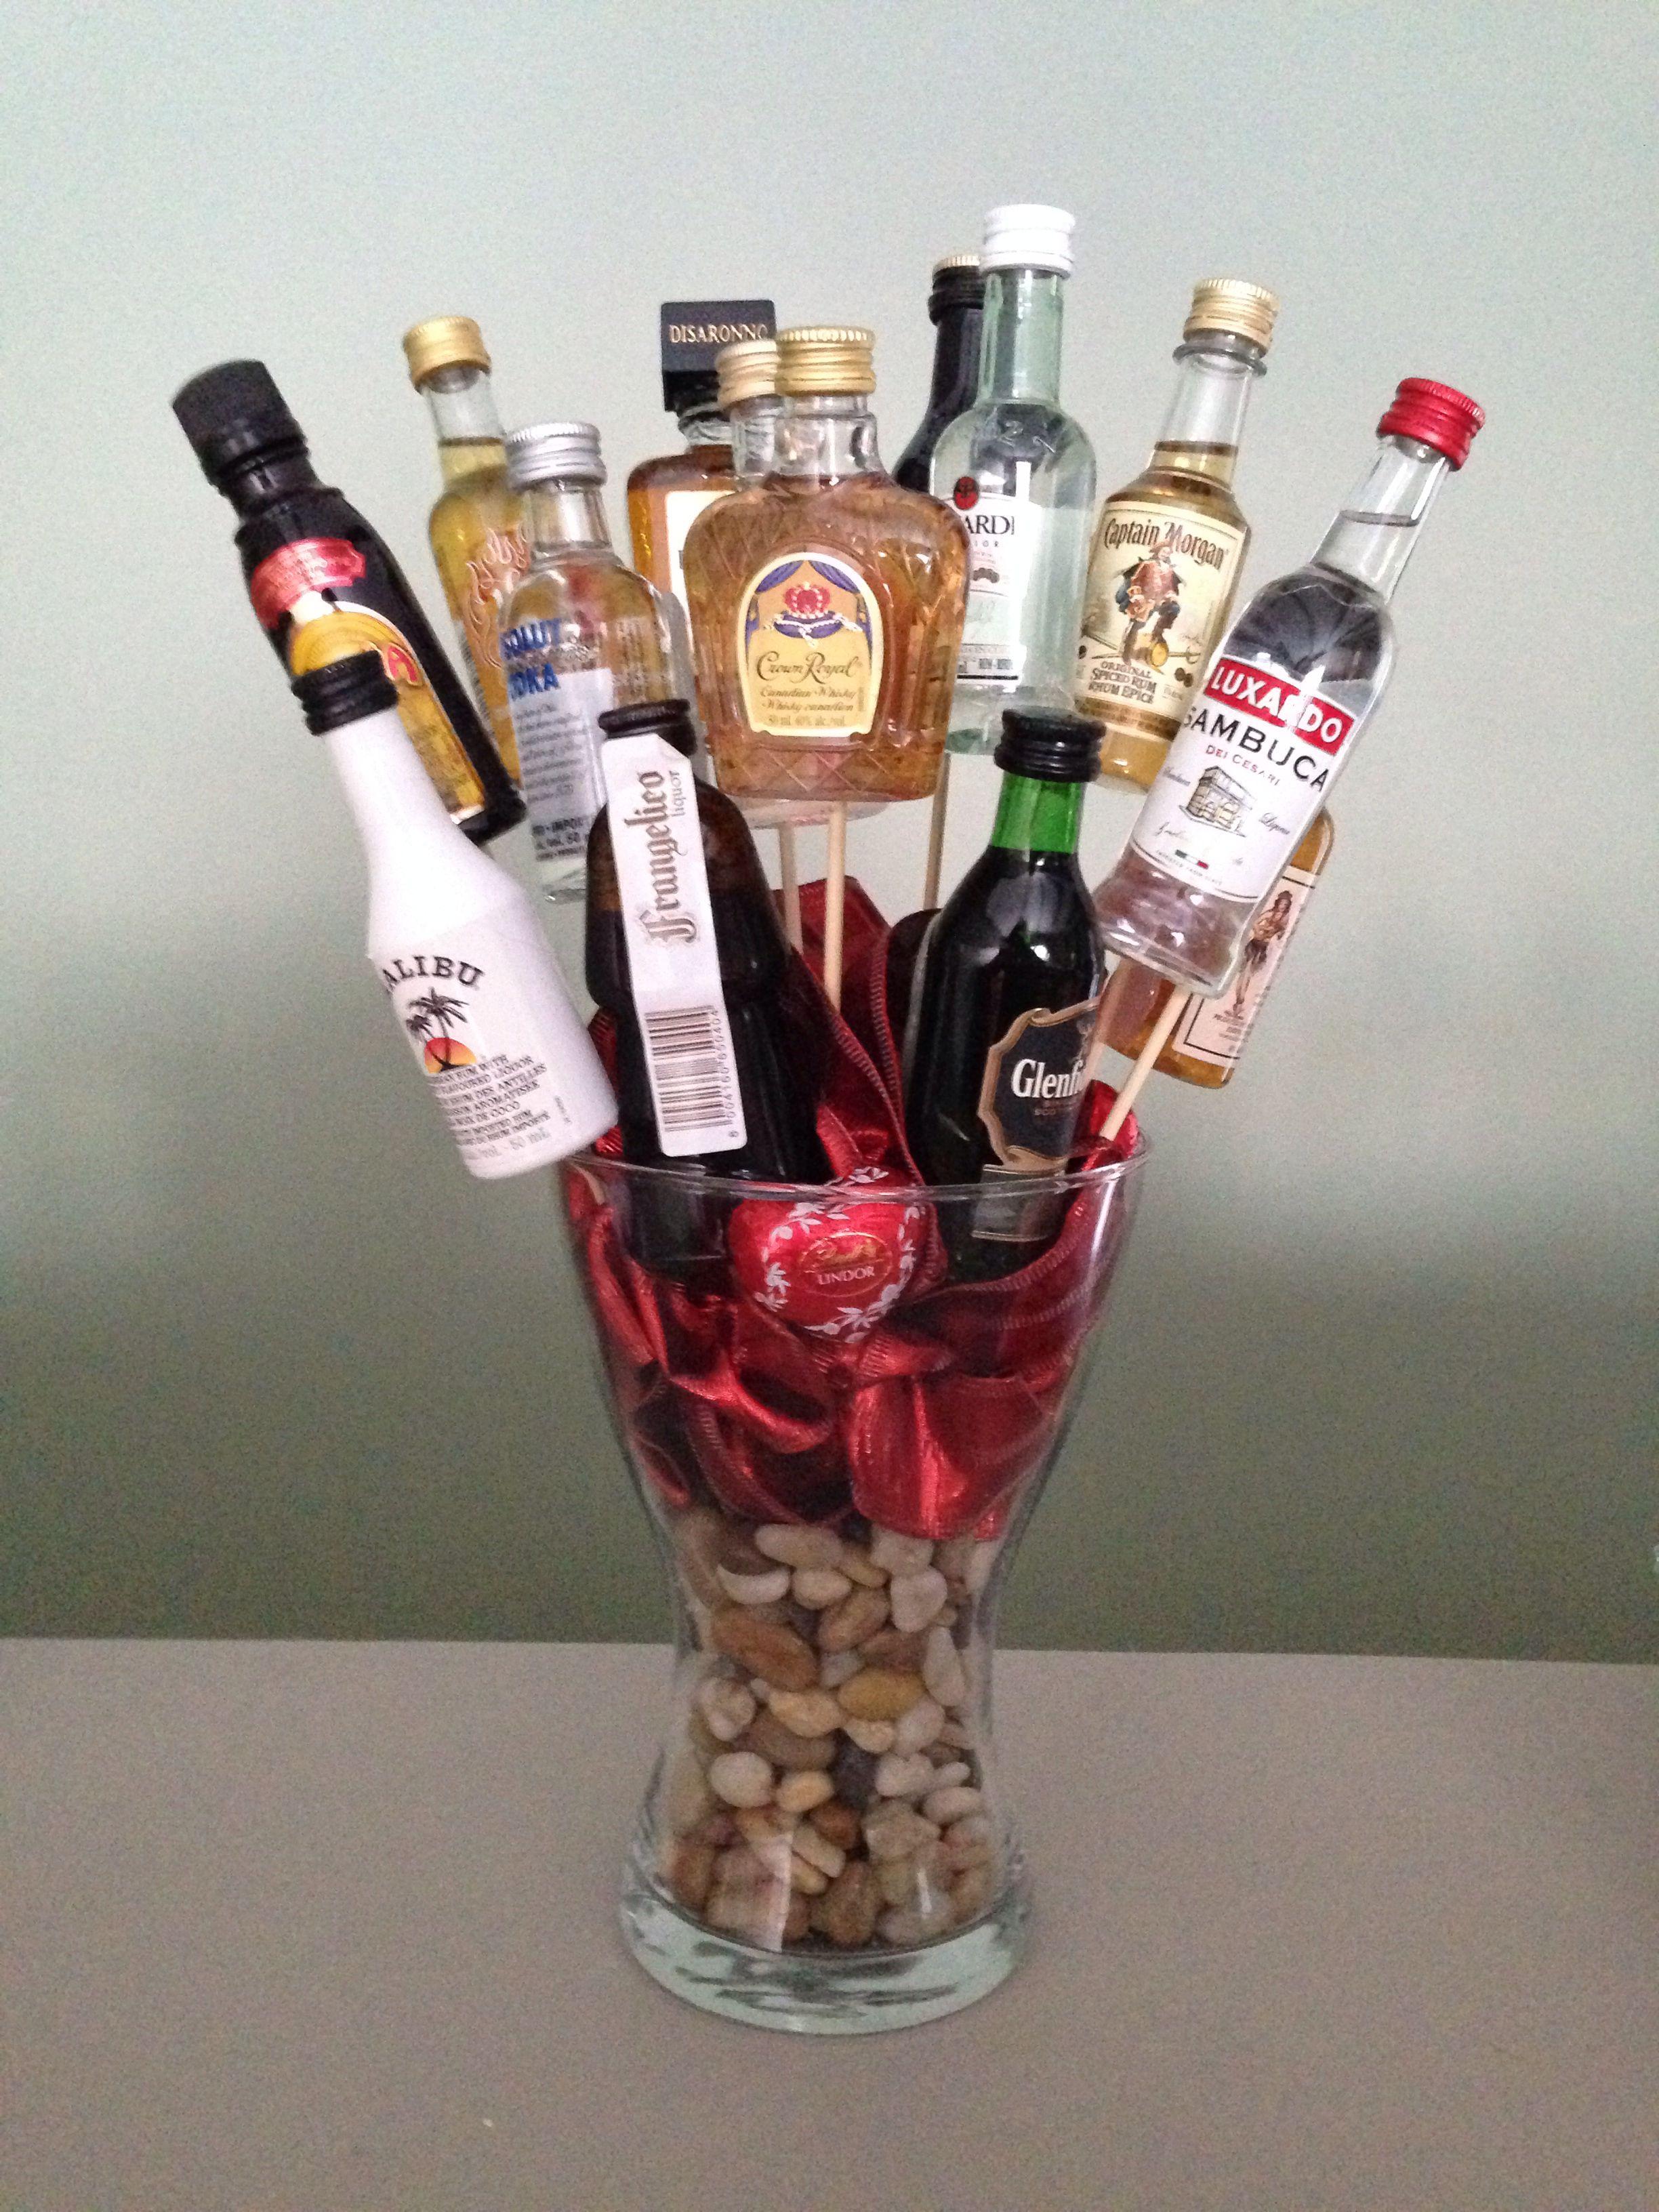 Mini Liquor Bouquet Mini Liquor Bottles Liquor Gifts Liquor Gift Baskets